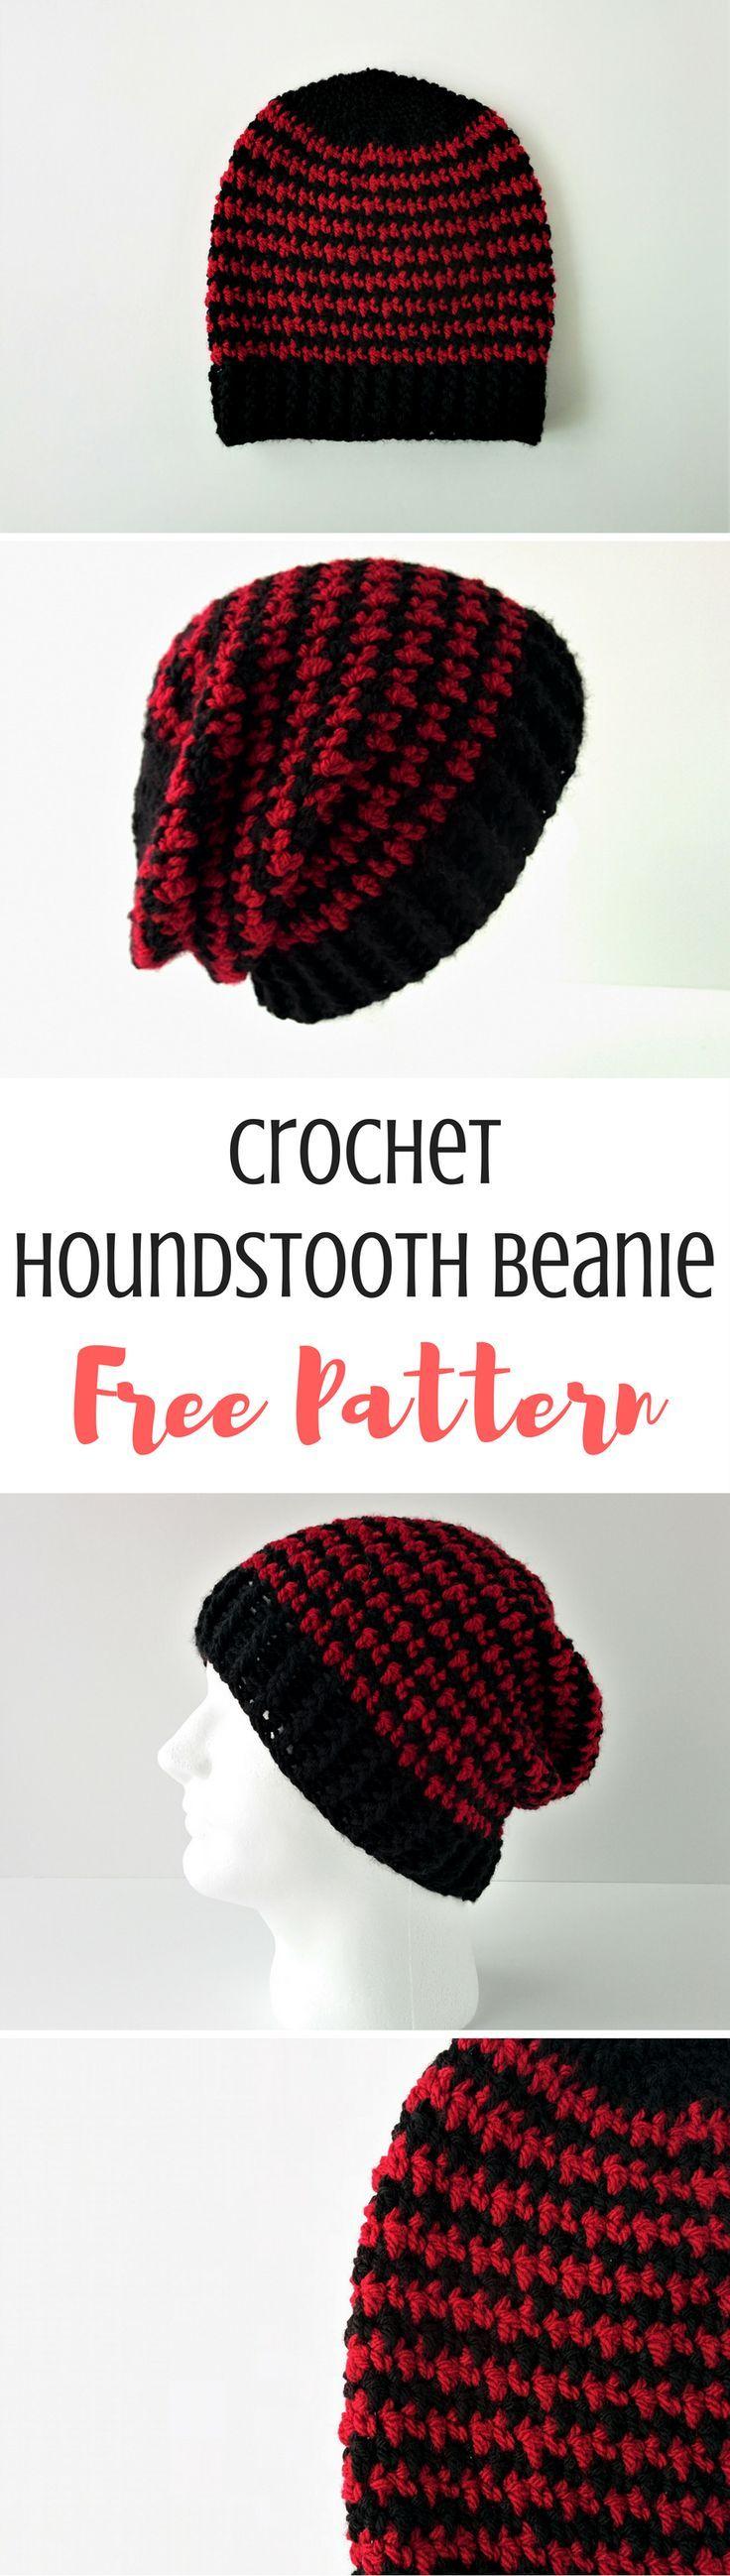 Houndstooth Beanie FREE Crochet Pattern